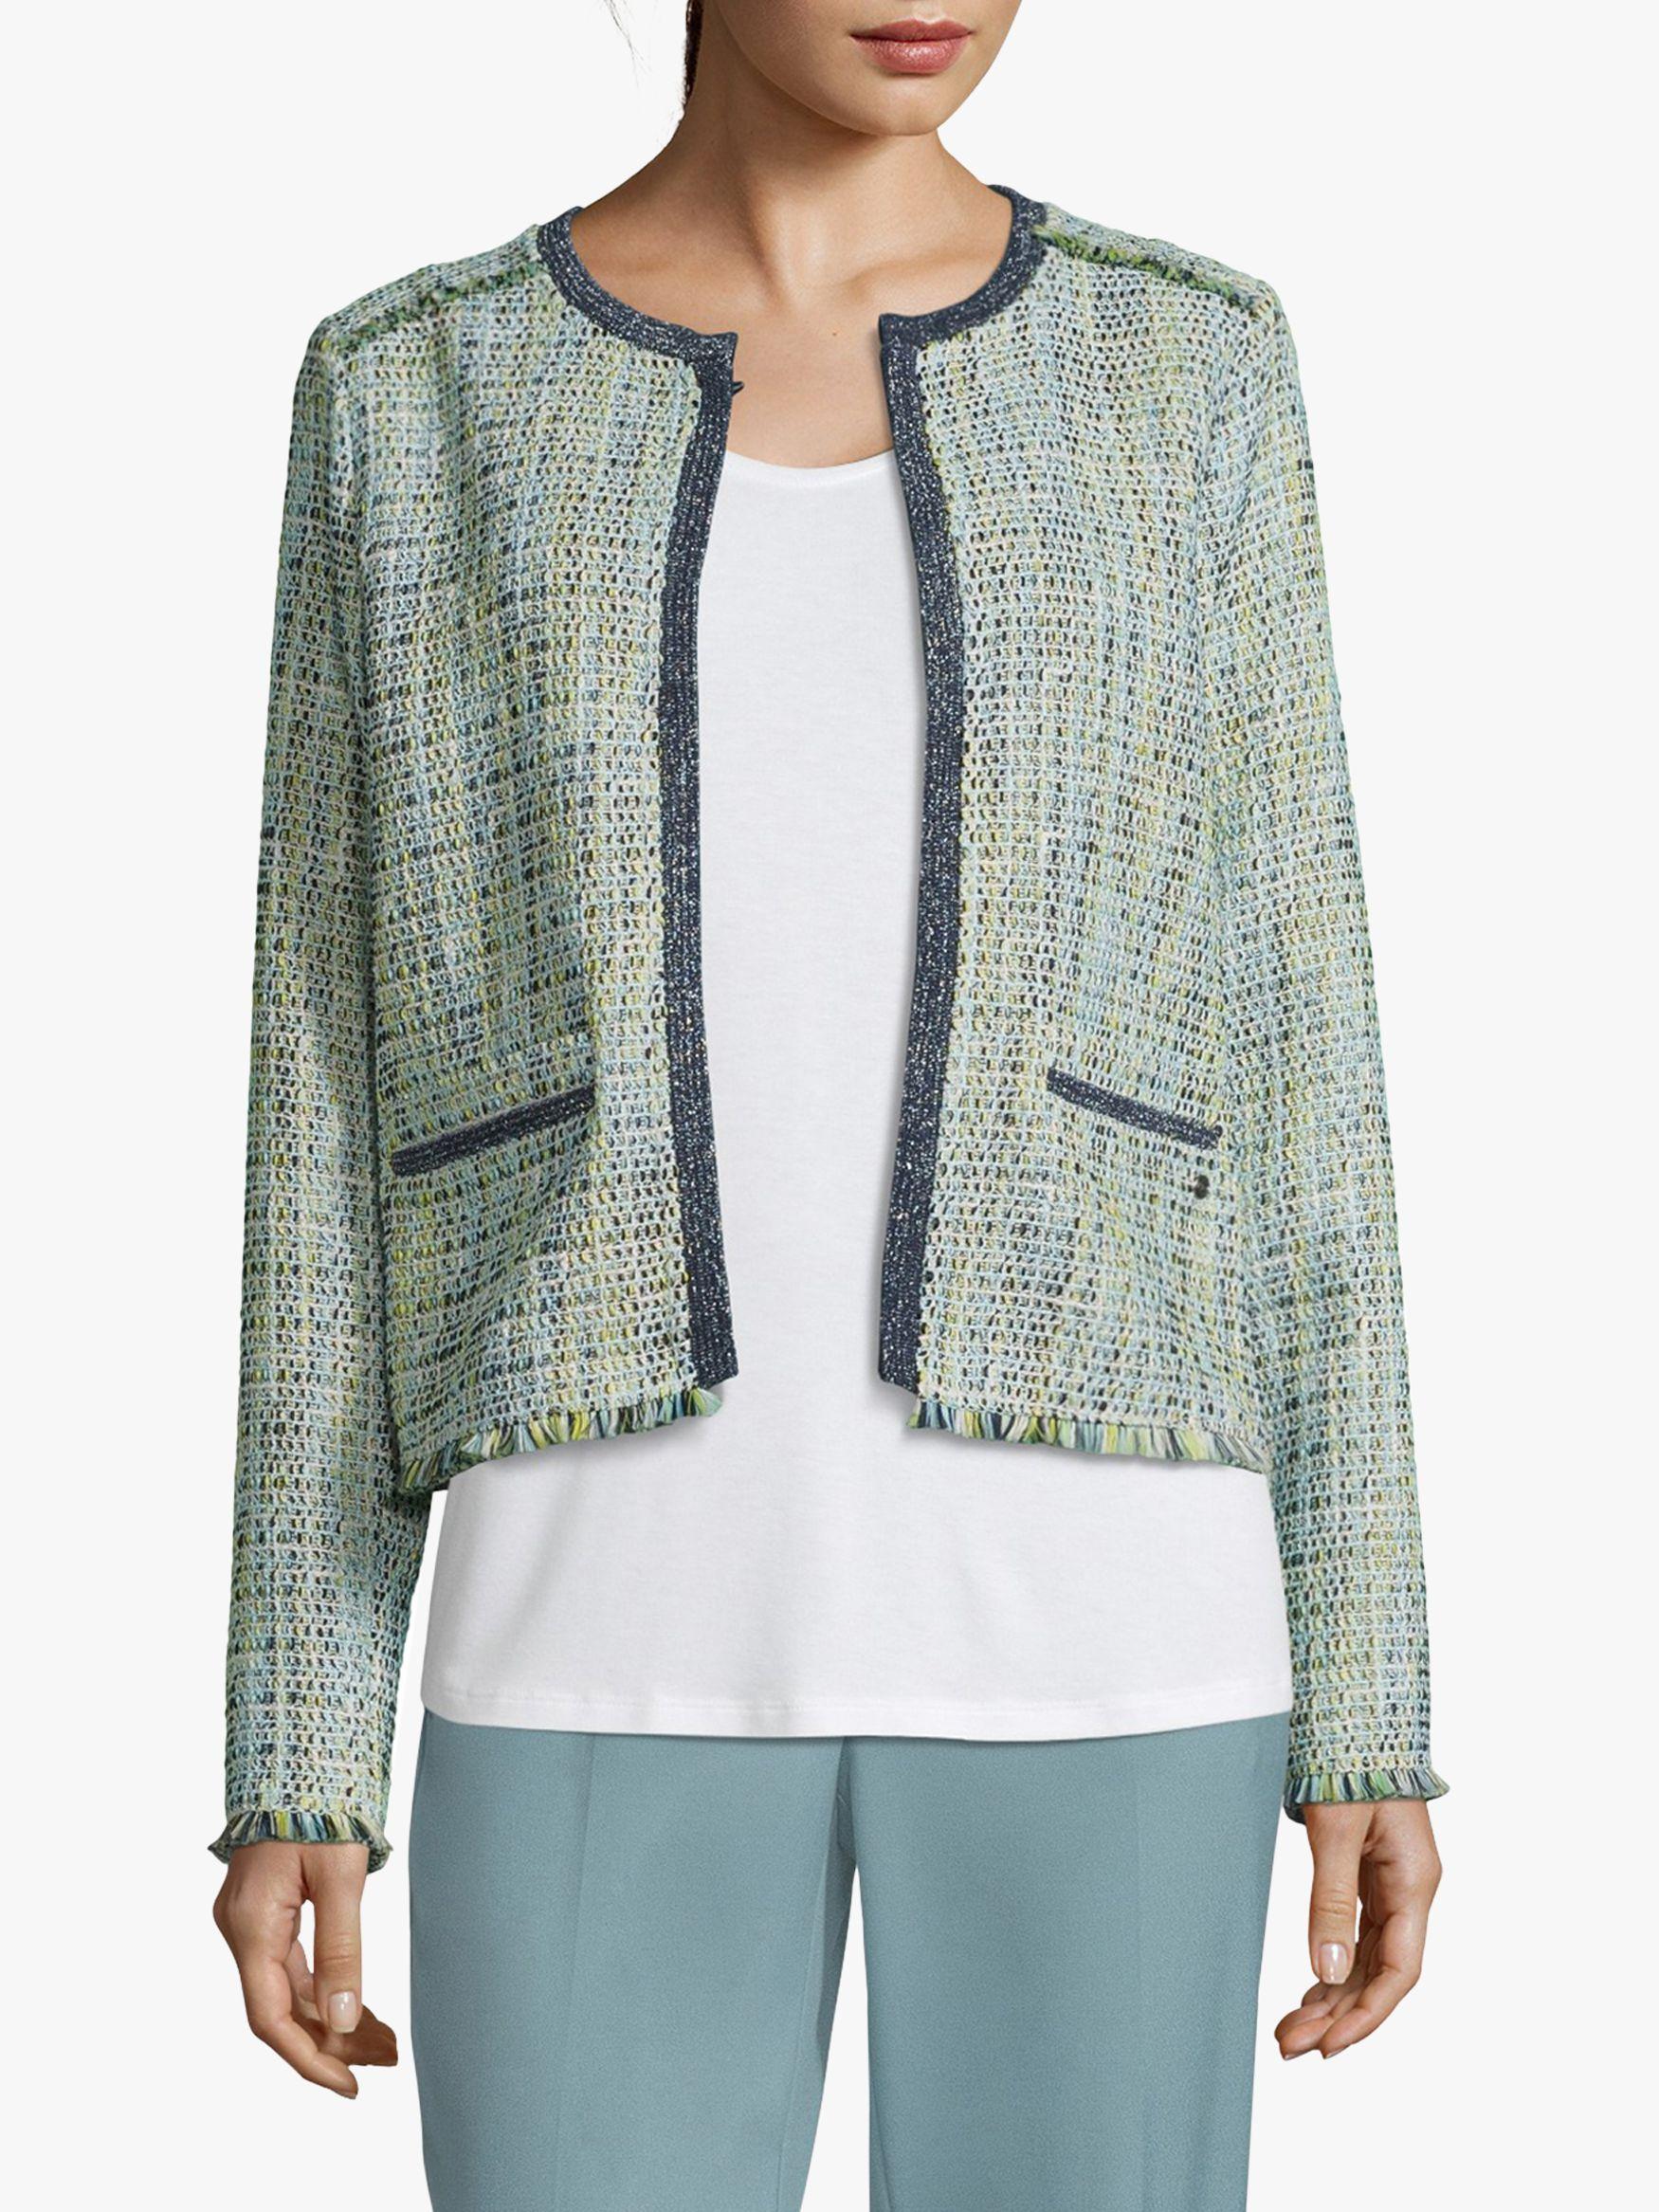 Betty & Co. Betty & Co. Unlined Woven Jacket, Cream/Green